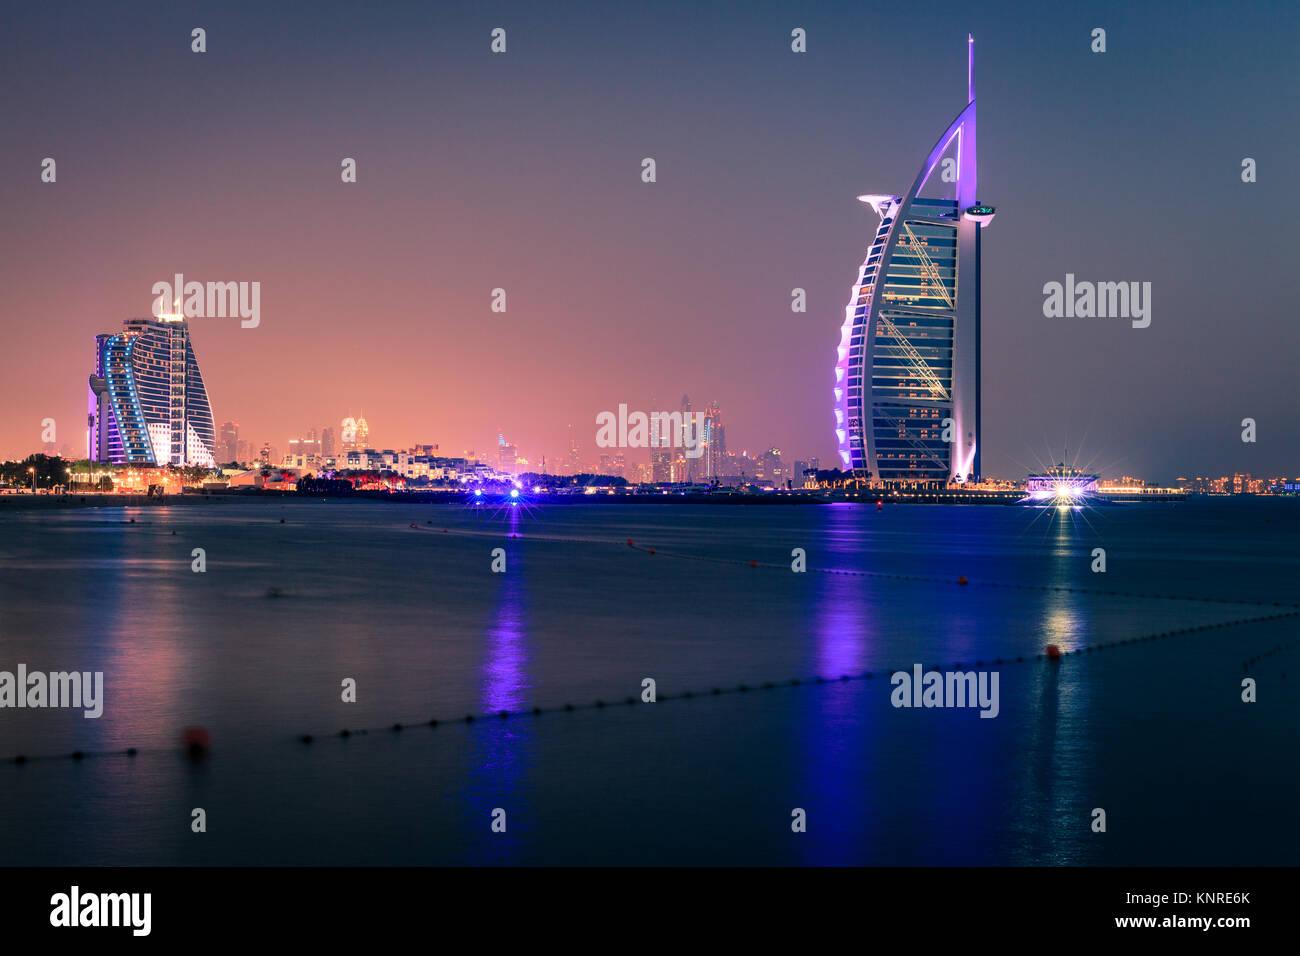 Dubai, VAE, 7. Juni 2016: Blick auf den weltberühmten Burj Al Arab und Jumeirah Beach Hotels bei Nacht Stockbild